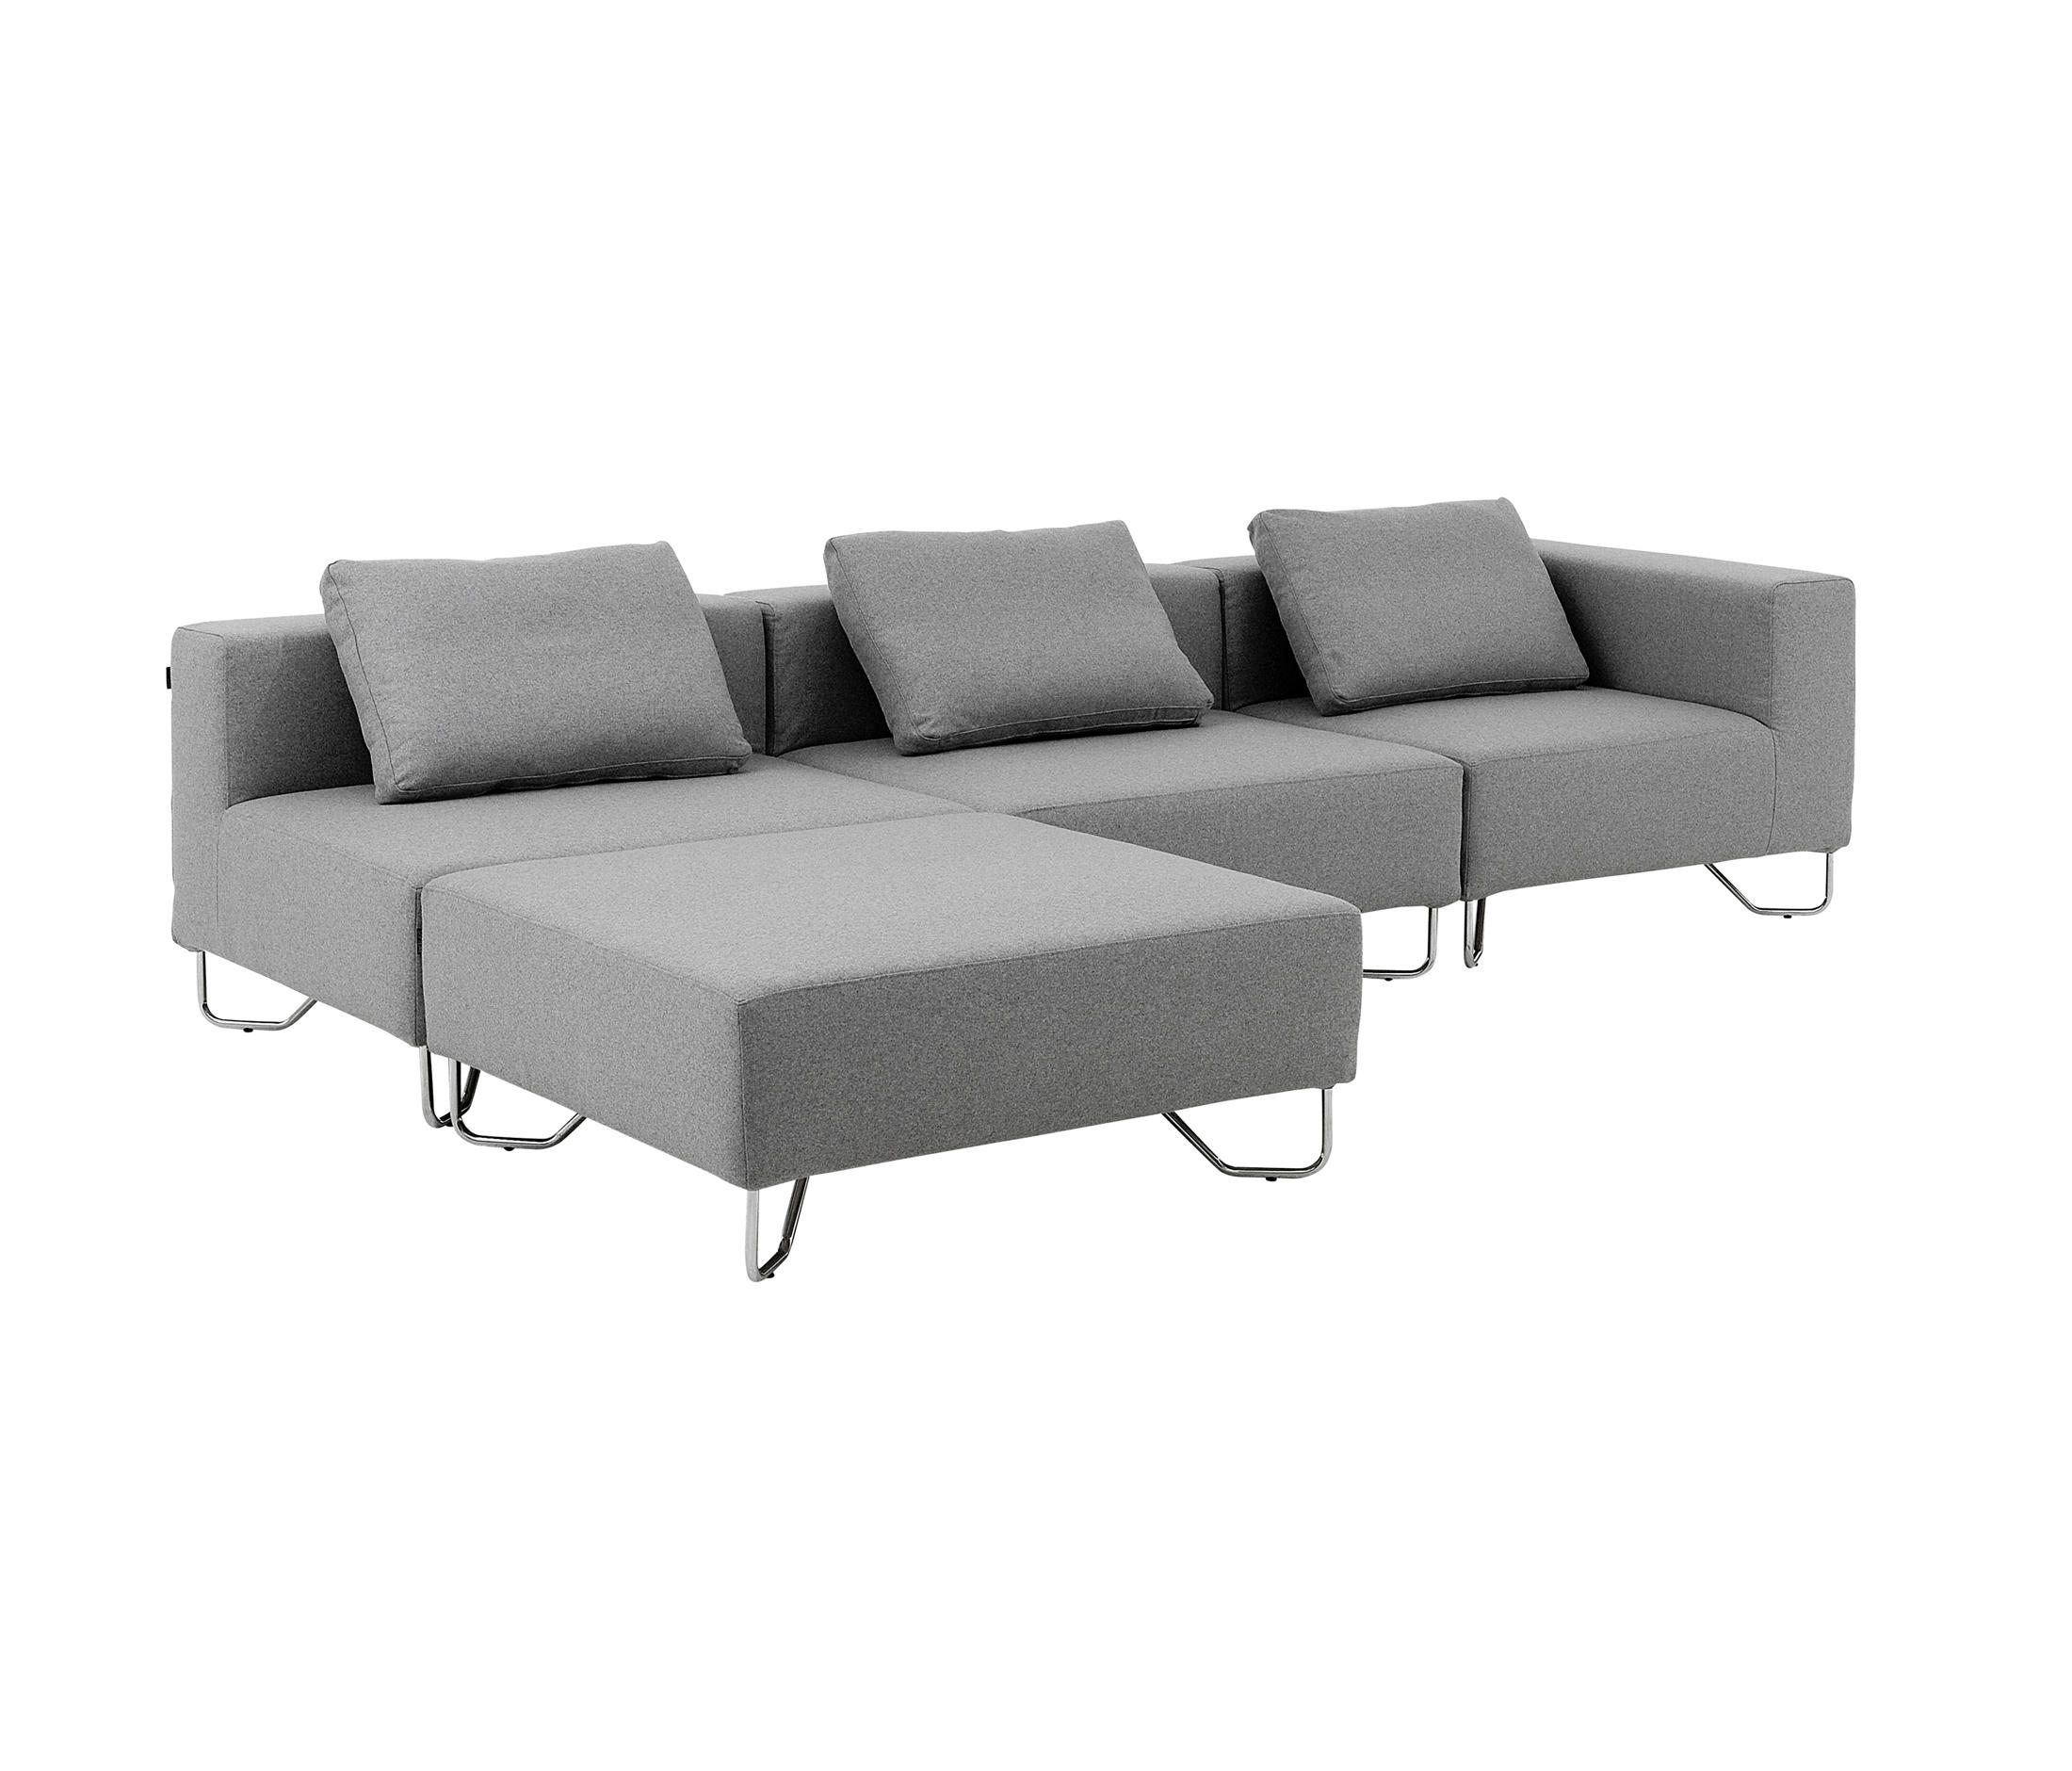 LOTUS SOFA - Modulare Sitzgruppen von Softline A/S | Architonic